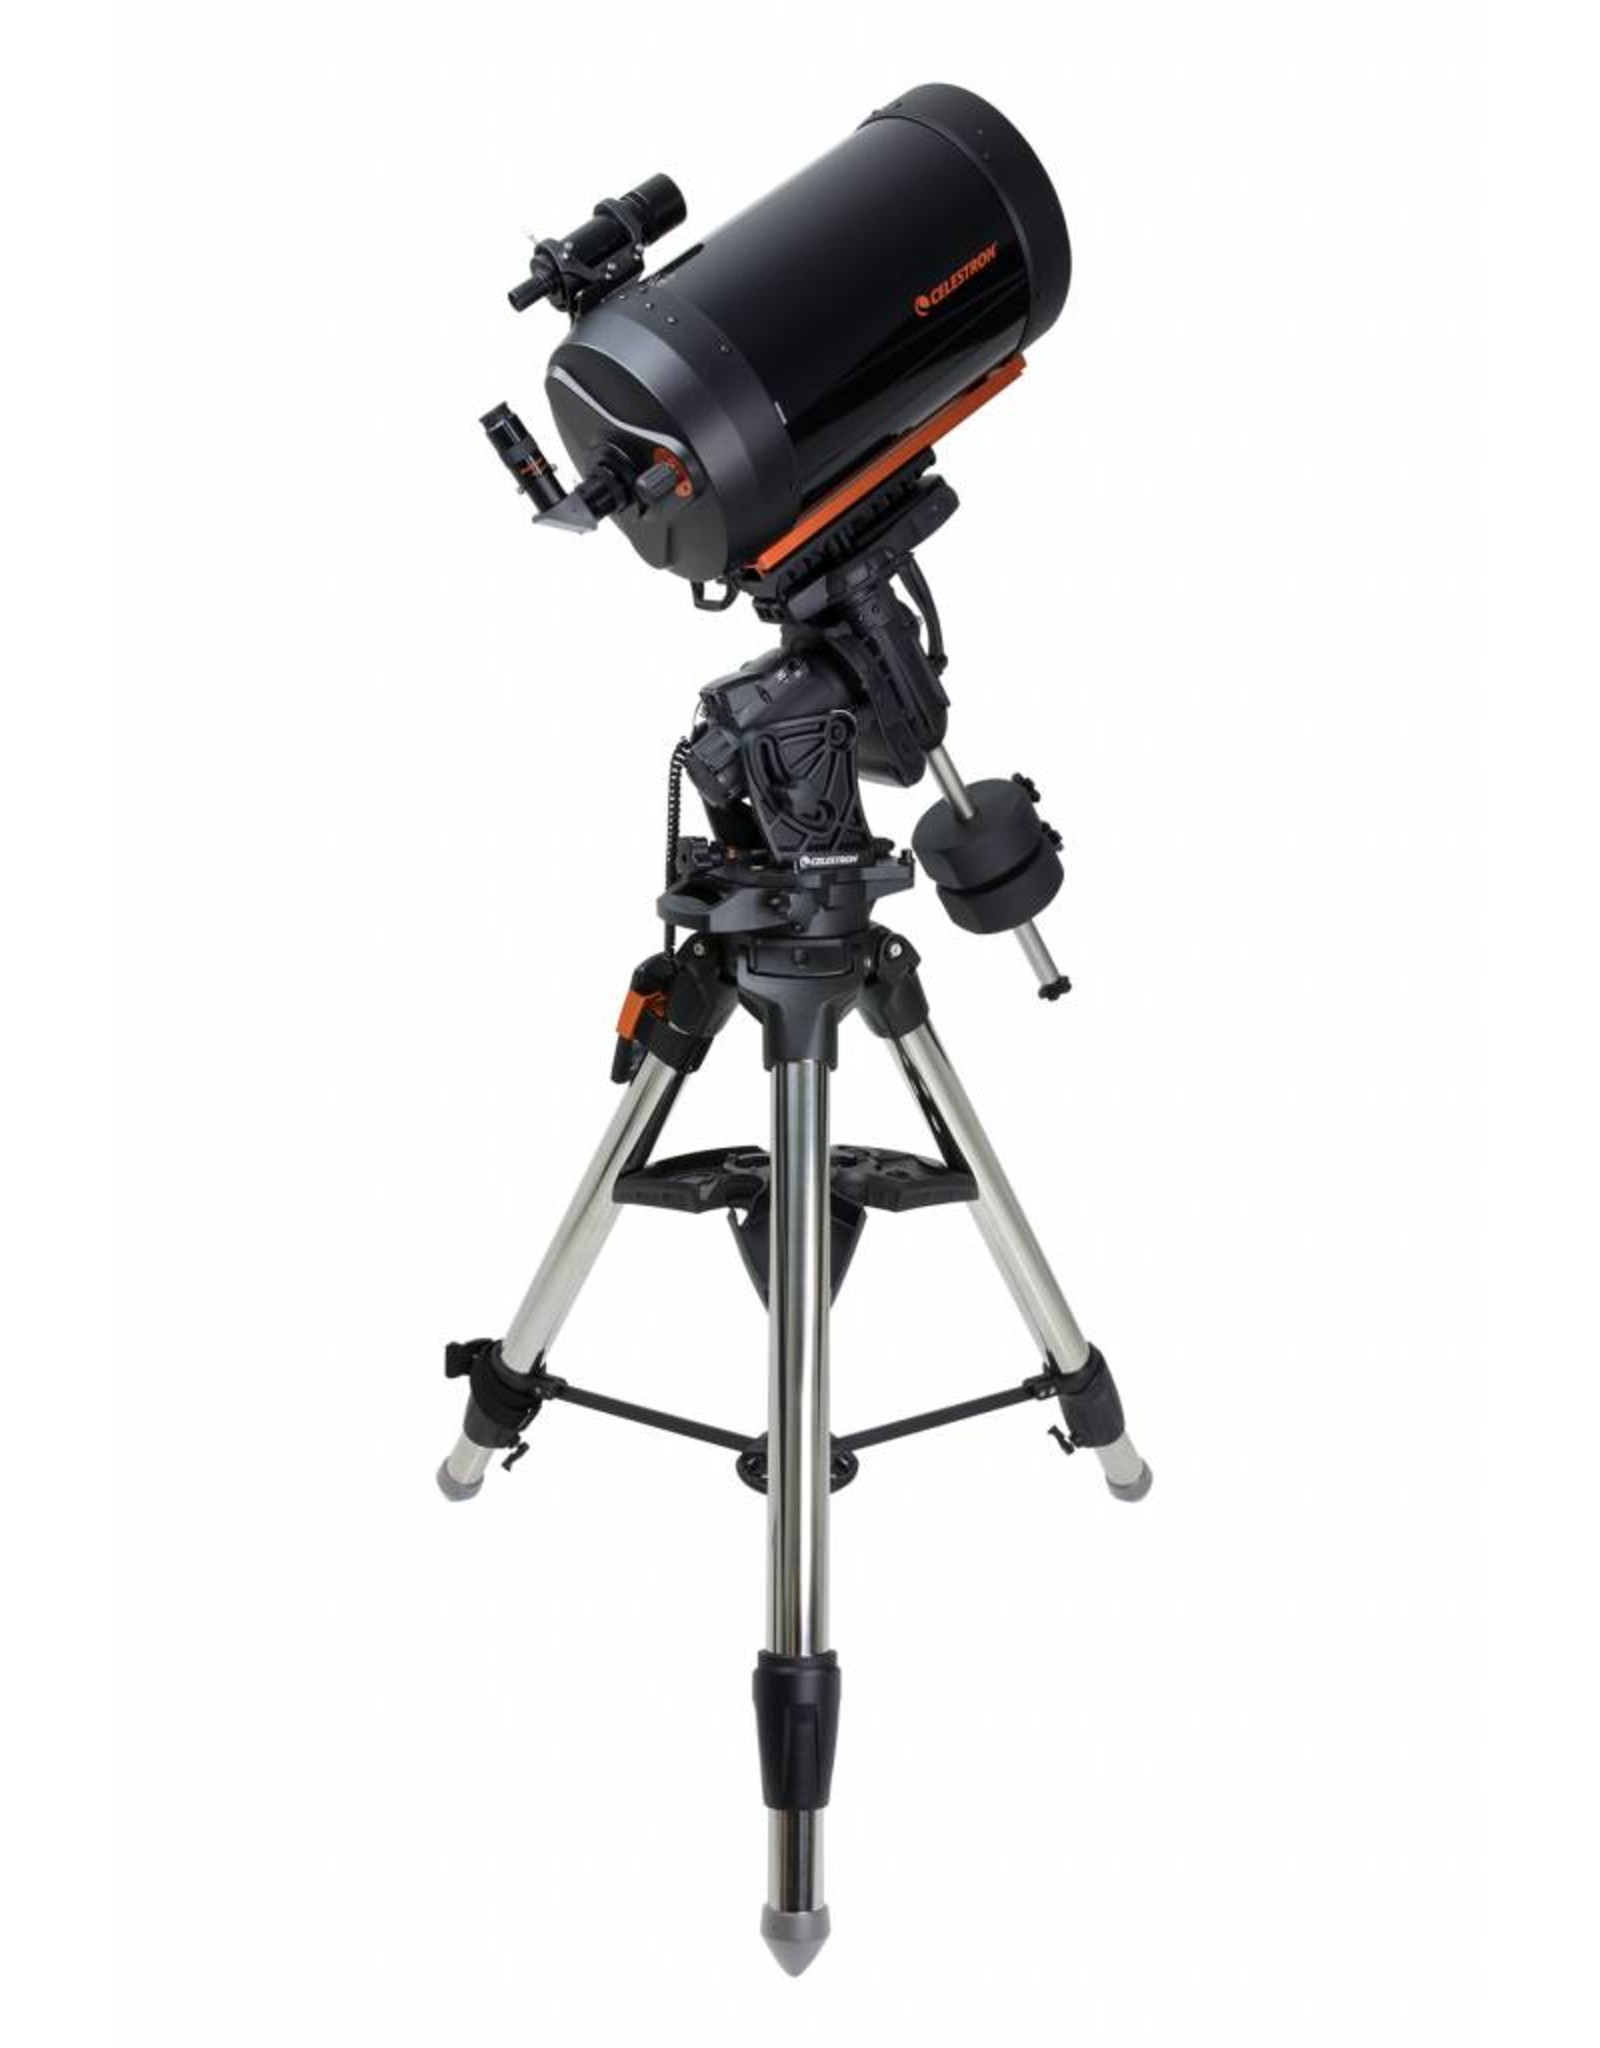 Celestron Celestron CGX-L Equatorial 1100 Schmidt-Cassegrain Telescope